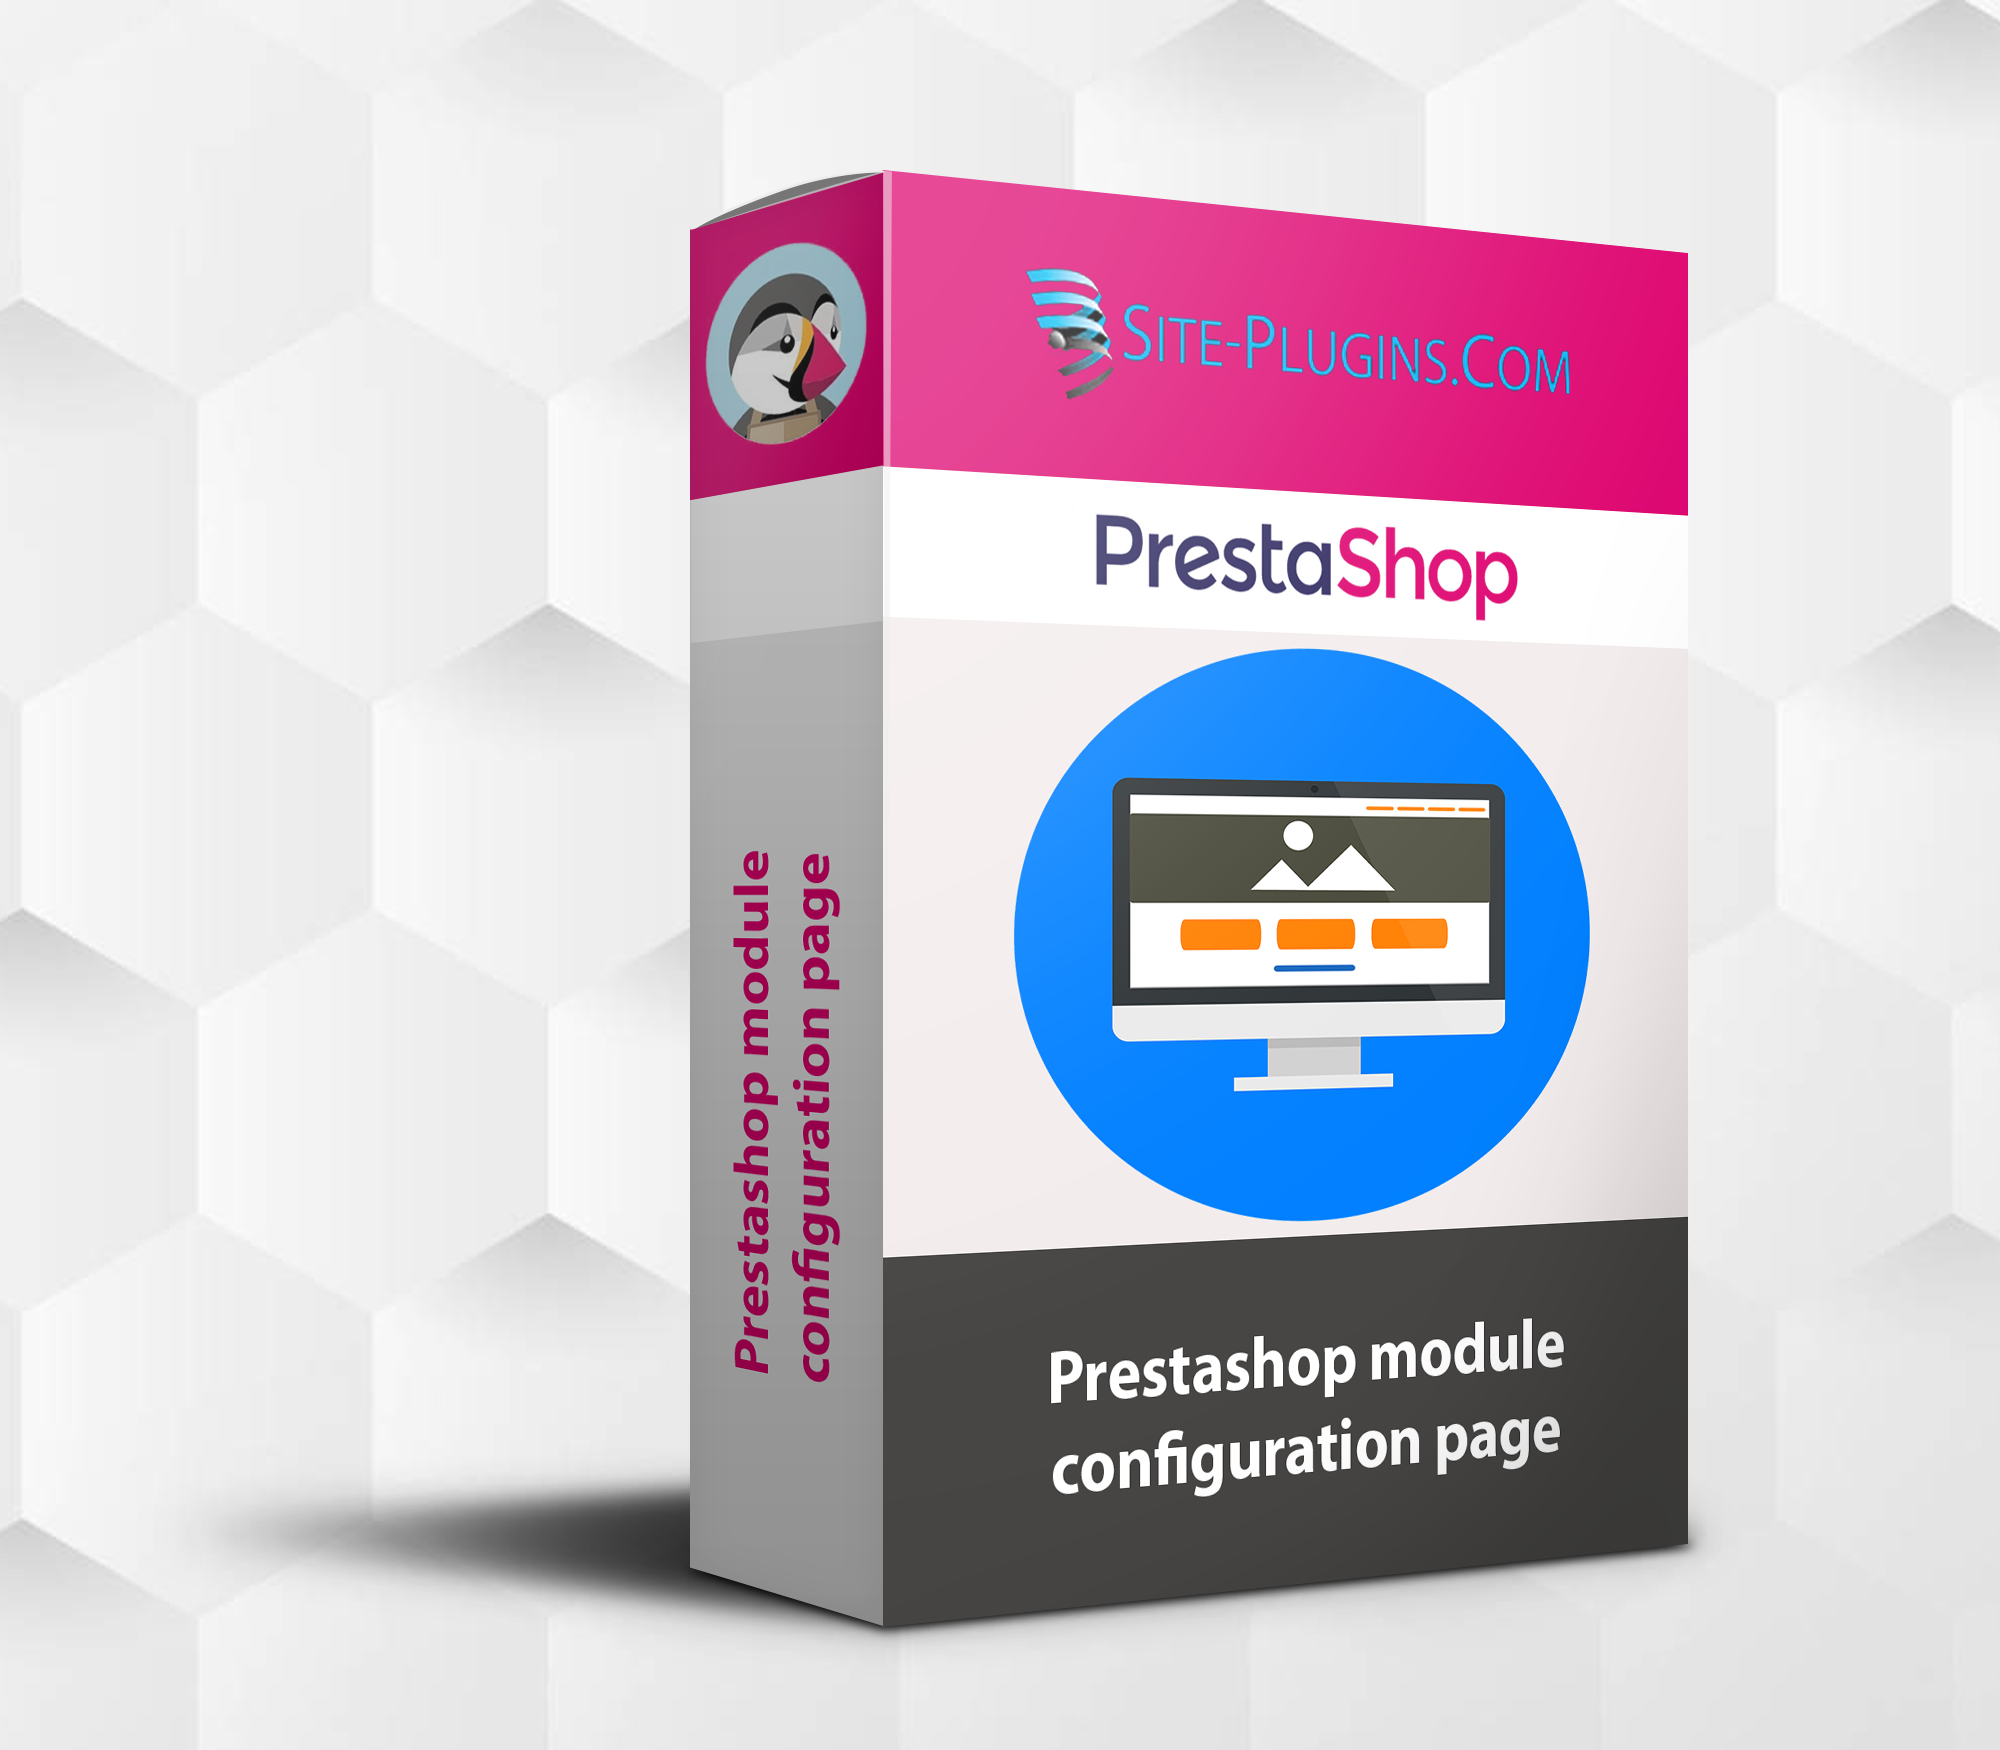 prestashop module configuration page